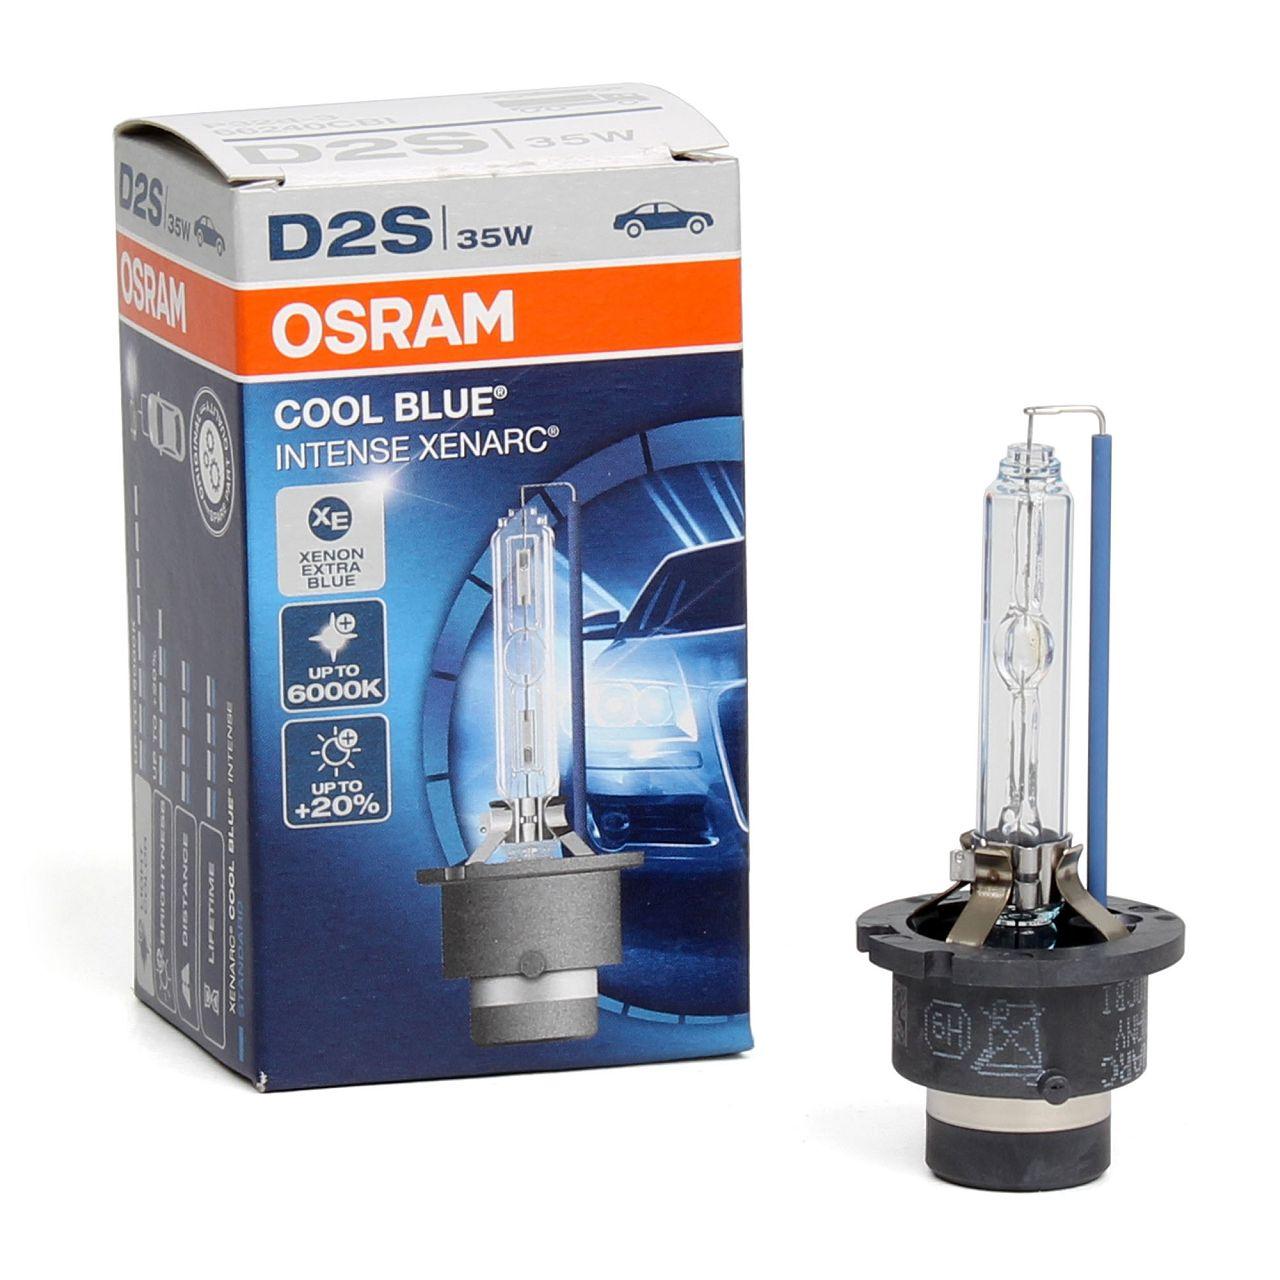 OSRAM Xenarc Xenon Brenner D2S COOL BLUE INTENSE CBI 85V 35W P32d-2 66240CBI